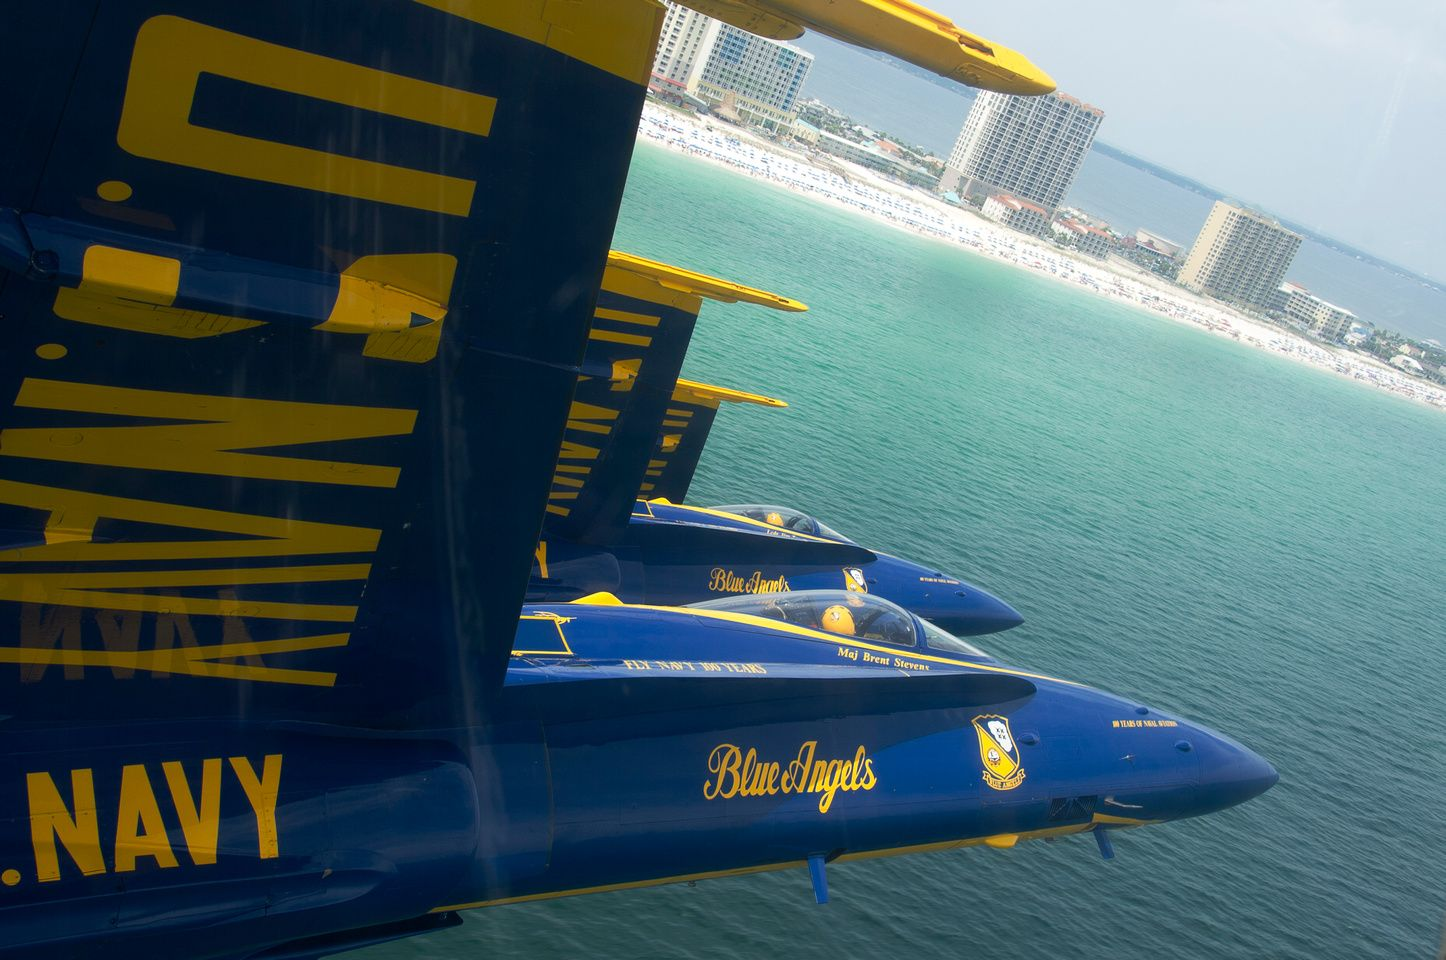 Slideshow Blue angels air show, Blue angels, Pensacola beach